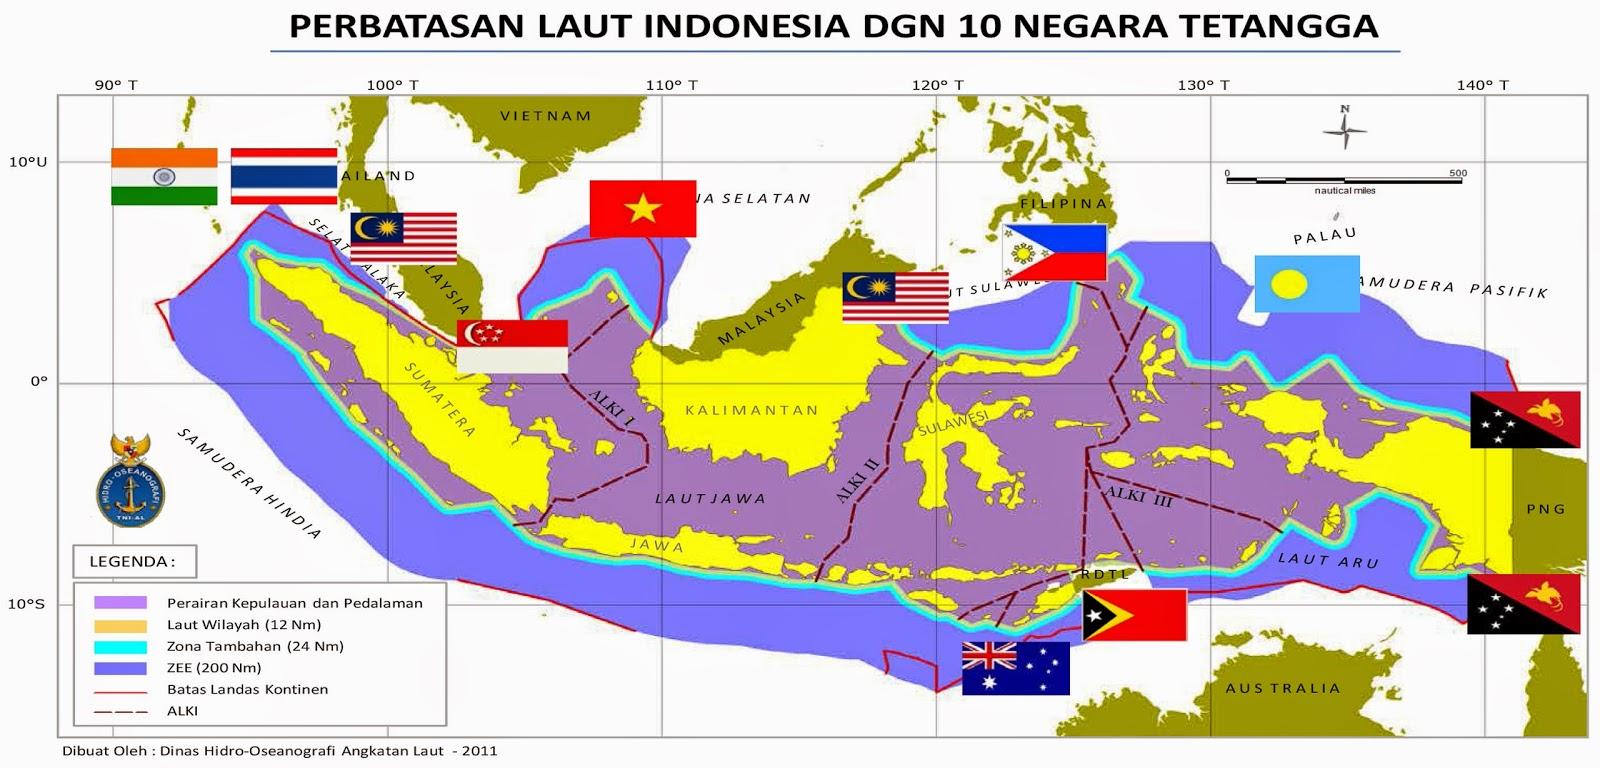 Presiden Jokowi Harus Segera Perkuat Perbatasan